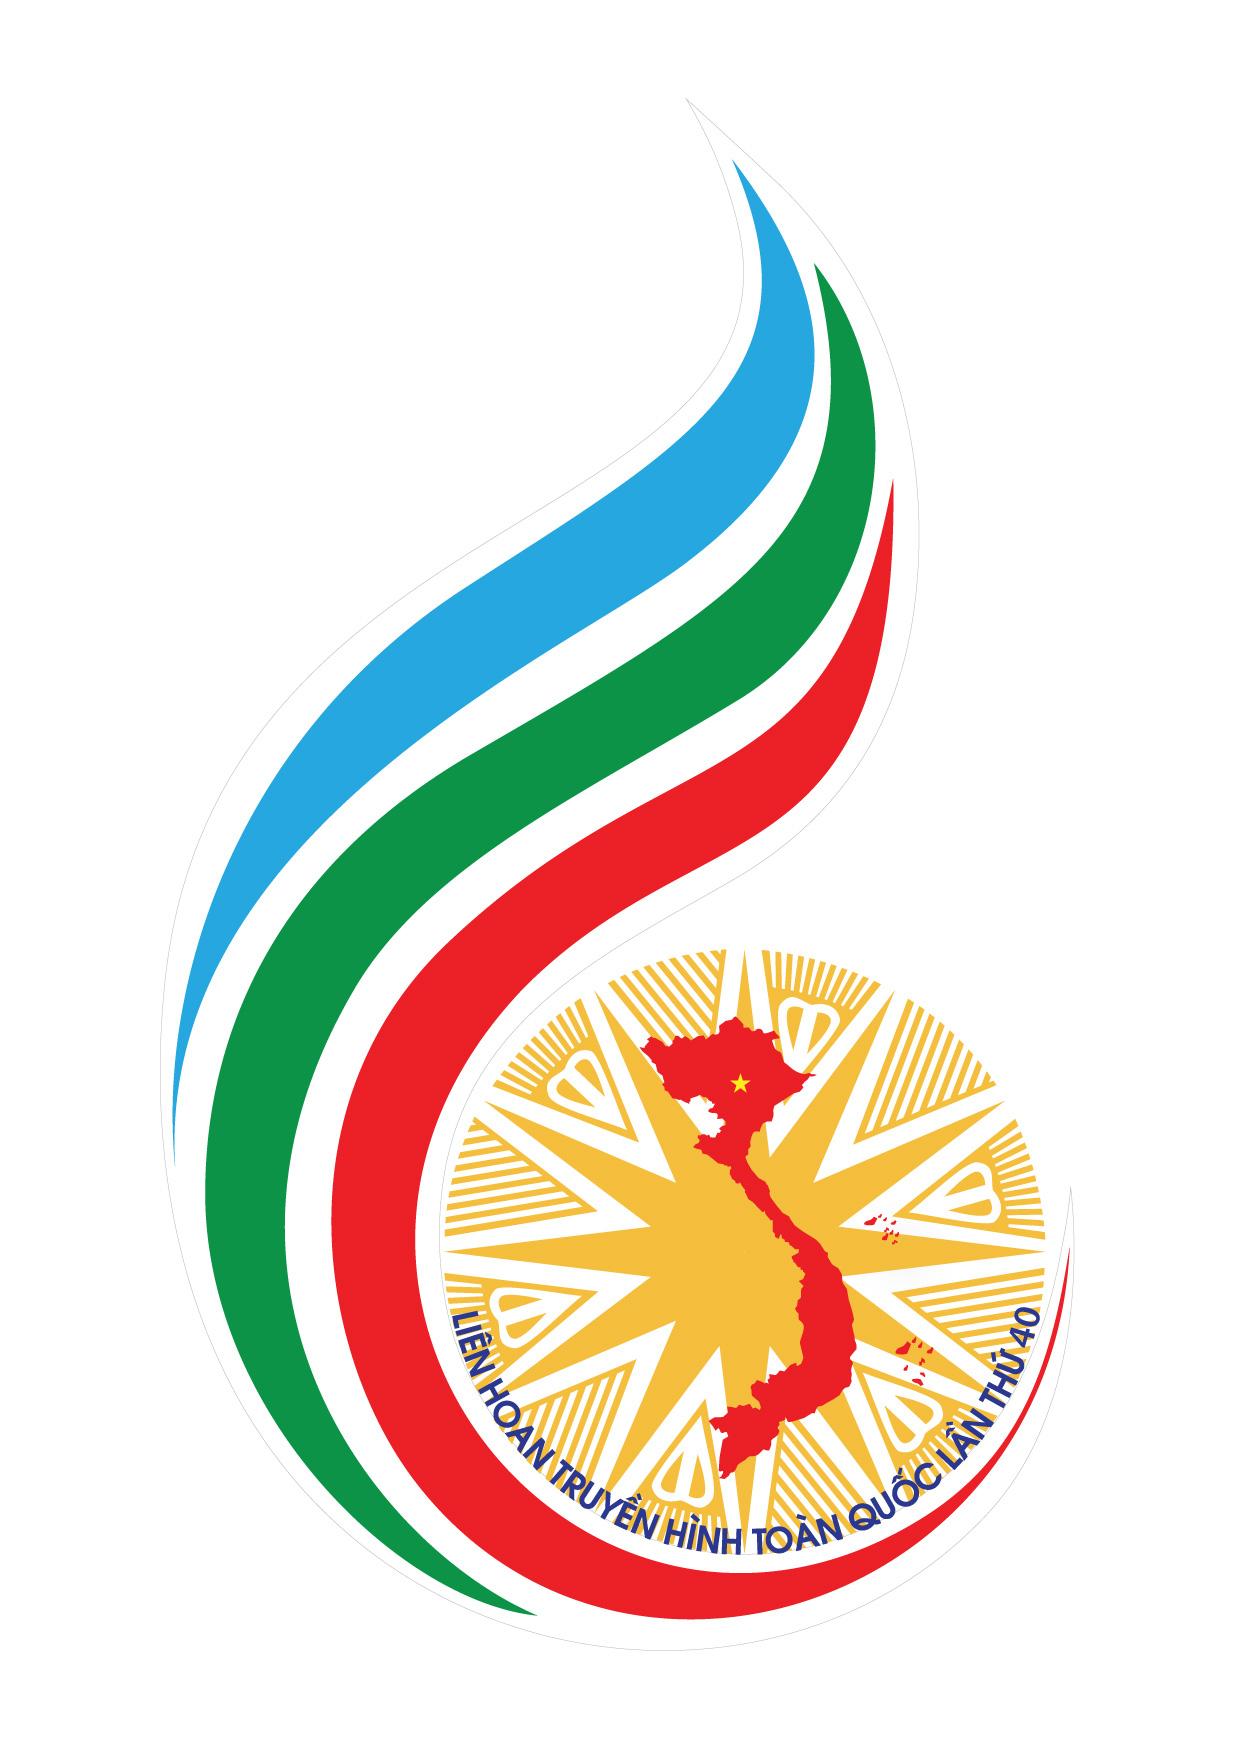 Logo LHTHTQ40 tai VTV-01